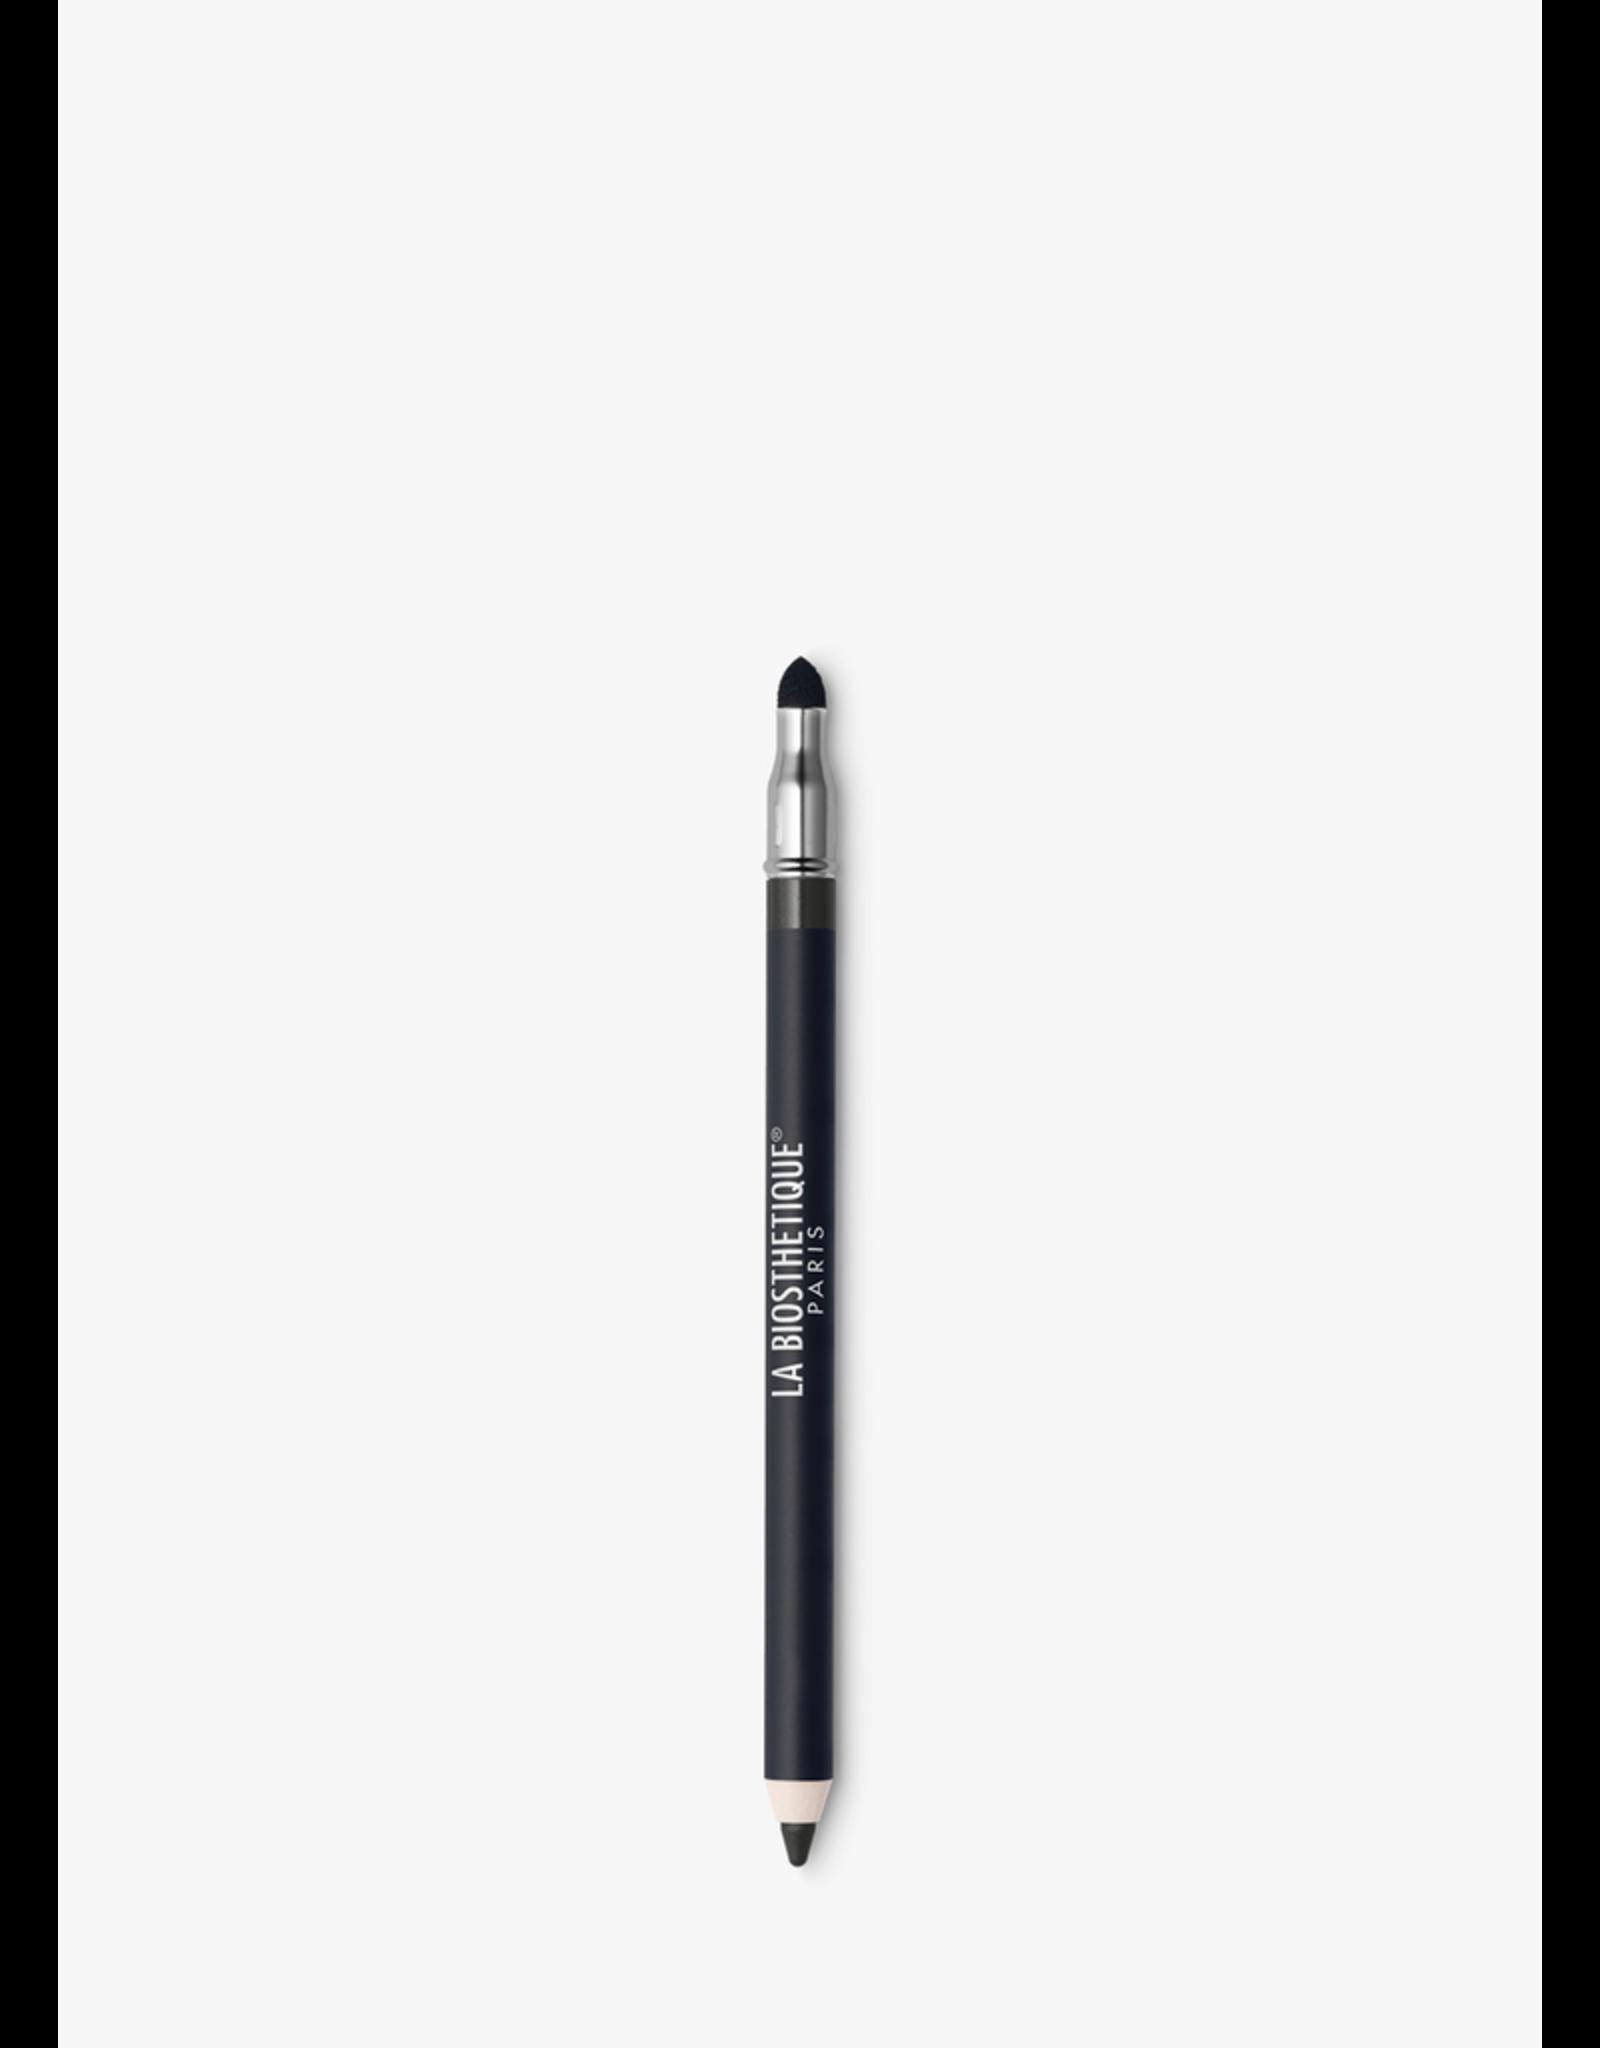 LA BIOSTHETIQUE Eye Performer - True Khol Eyeliner (1.2 g)